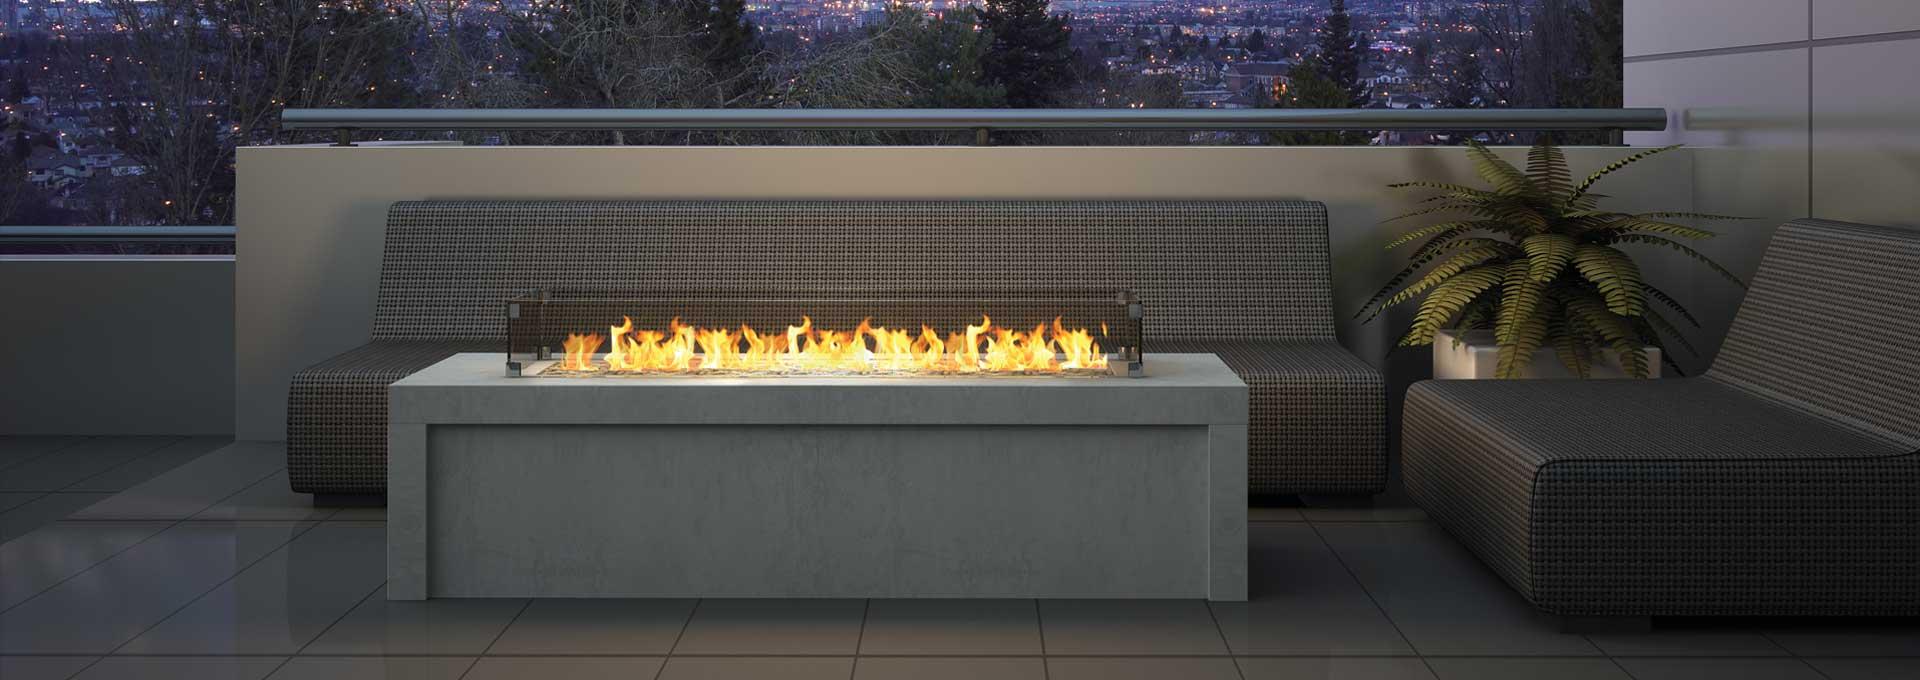 outdoor gas fireplace burner plateau pto30 regency fireplace products rh regency fire com outside fireplace burners outdoor gas fireplace burners